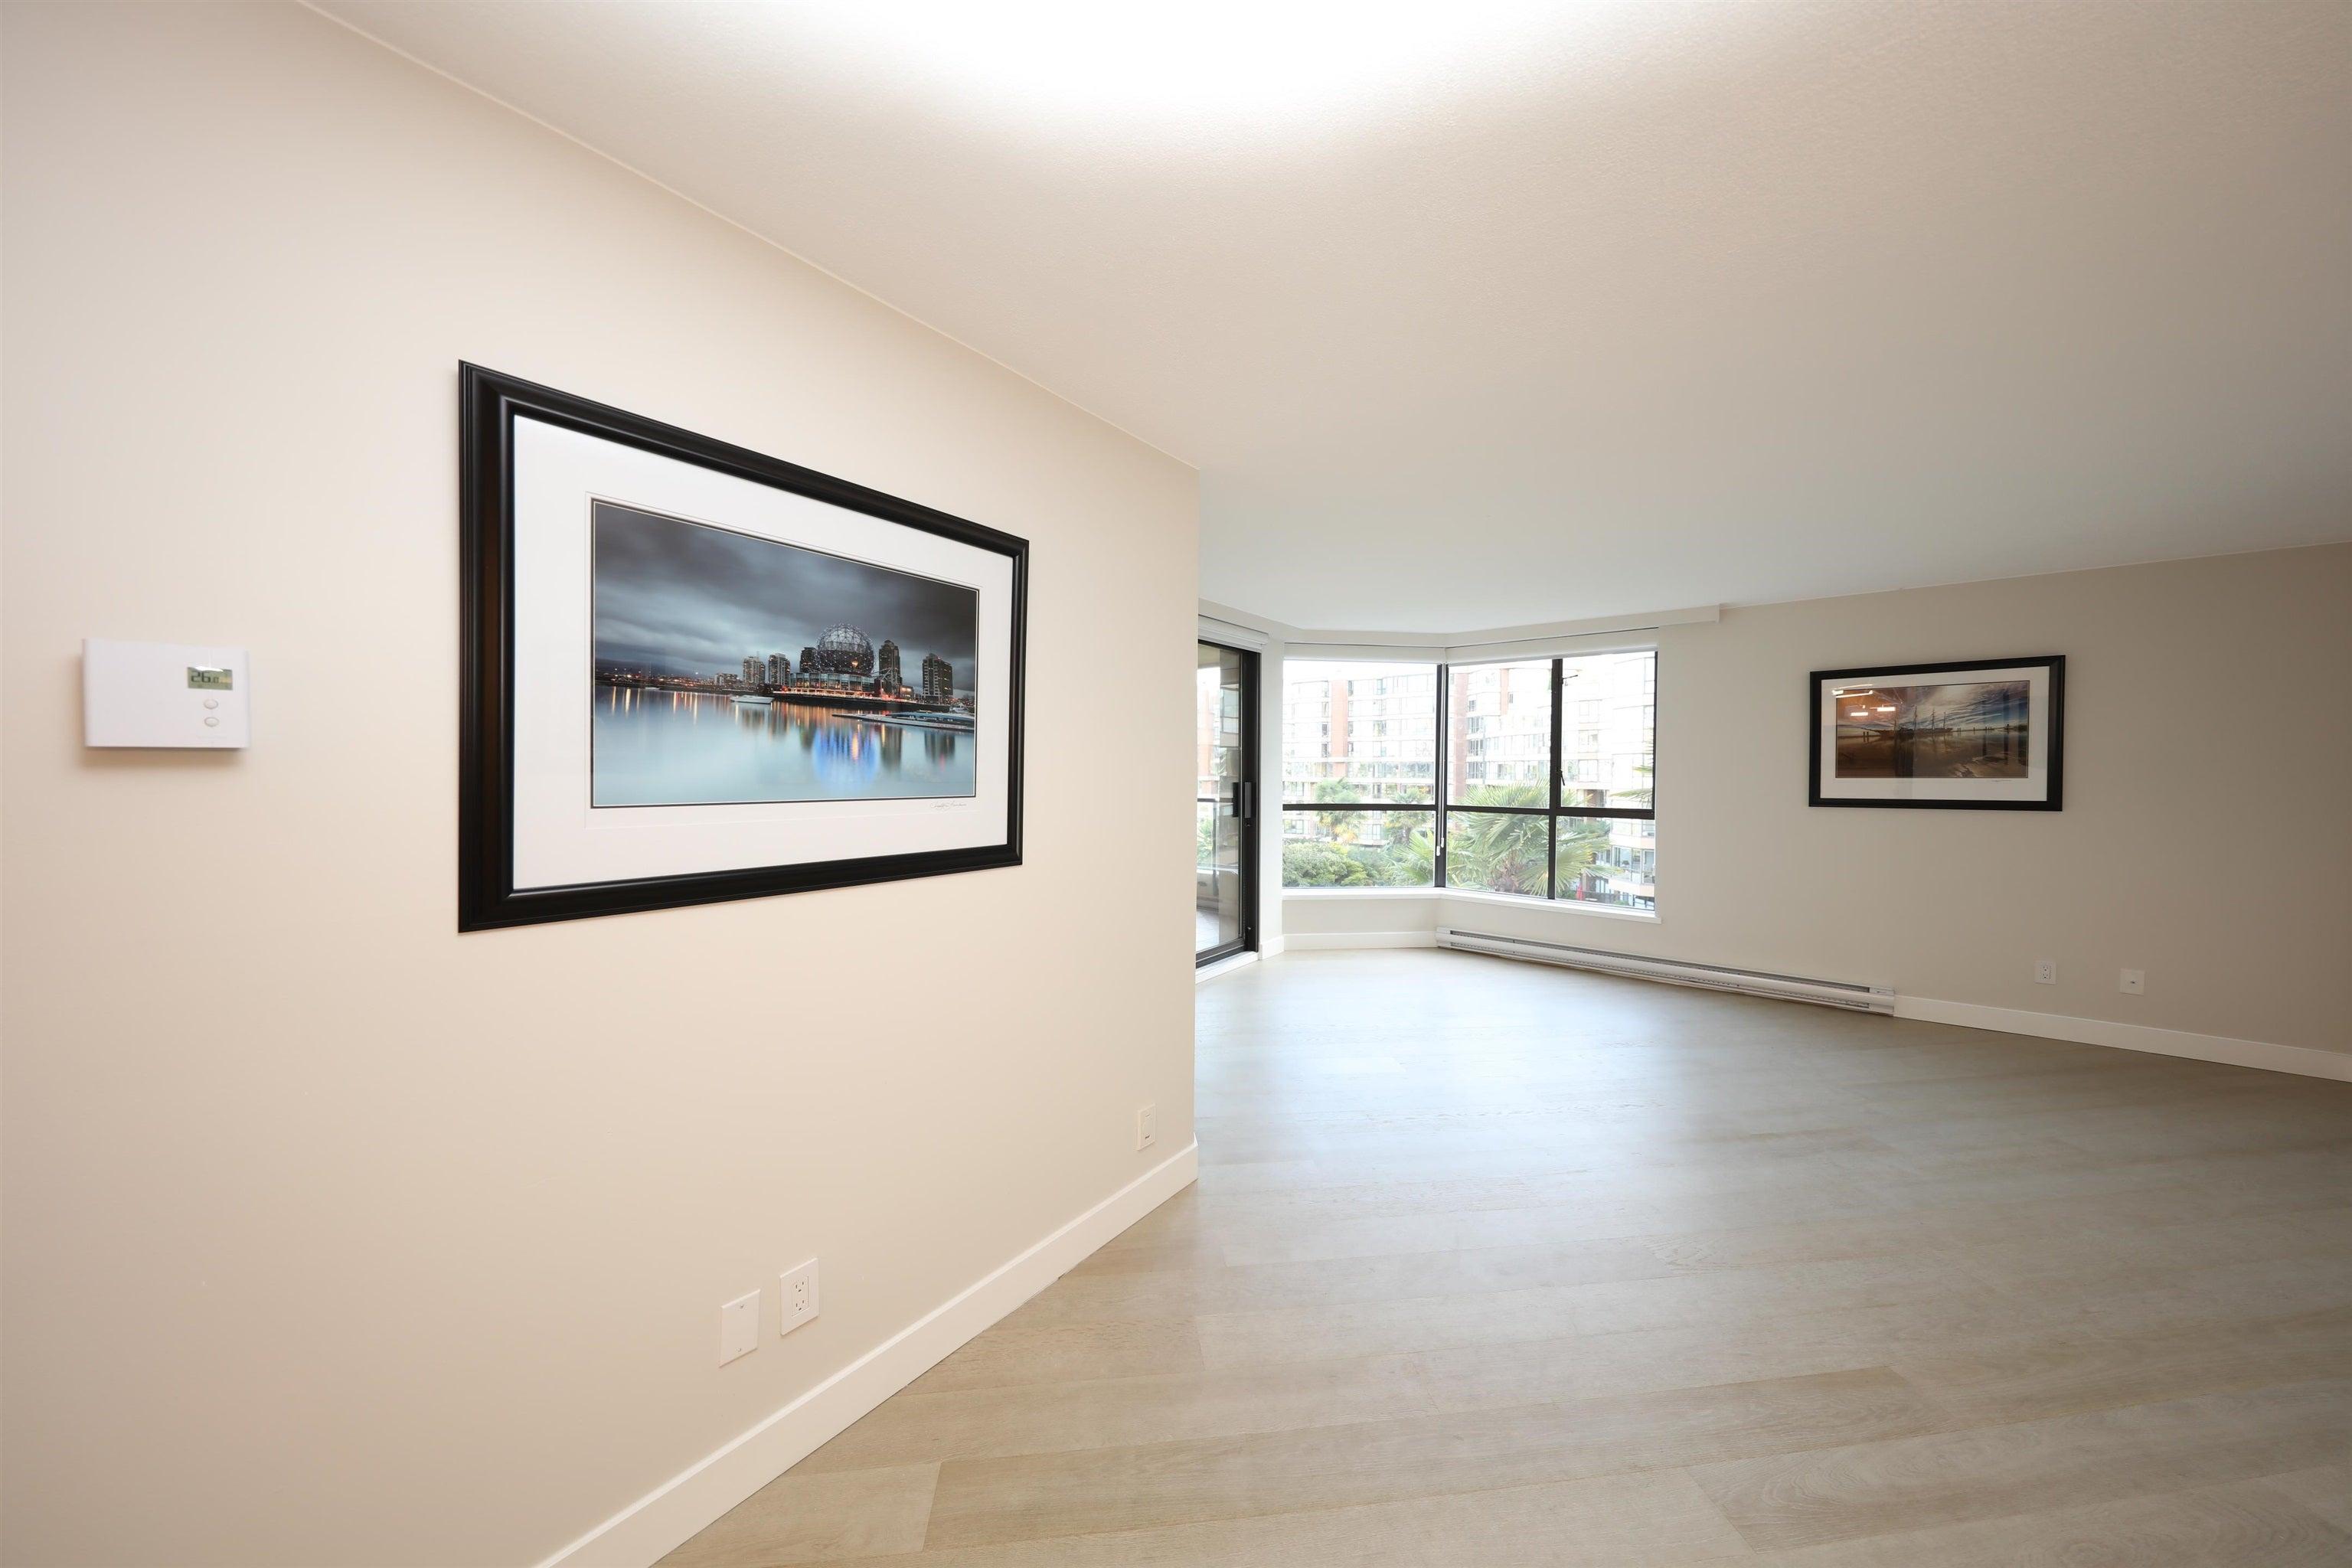 406 1450 PENNYFARTHING DRIVE - False Creek Apartment/Condo for sale, 2 Bedrooms (R2617259) - #32